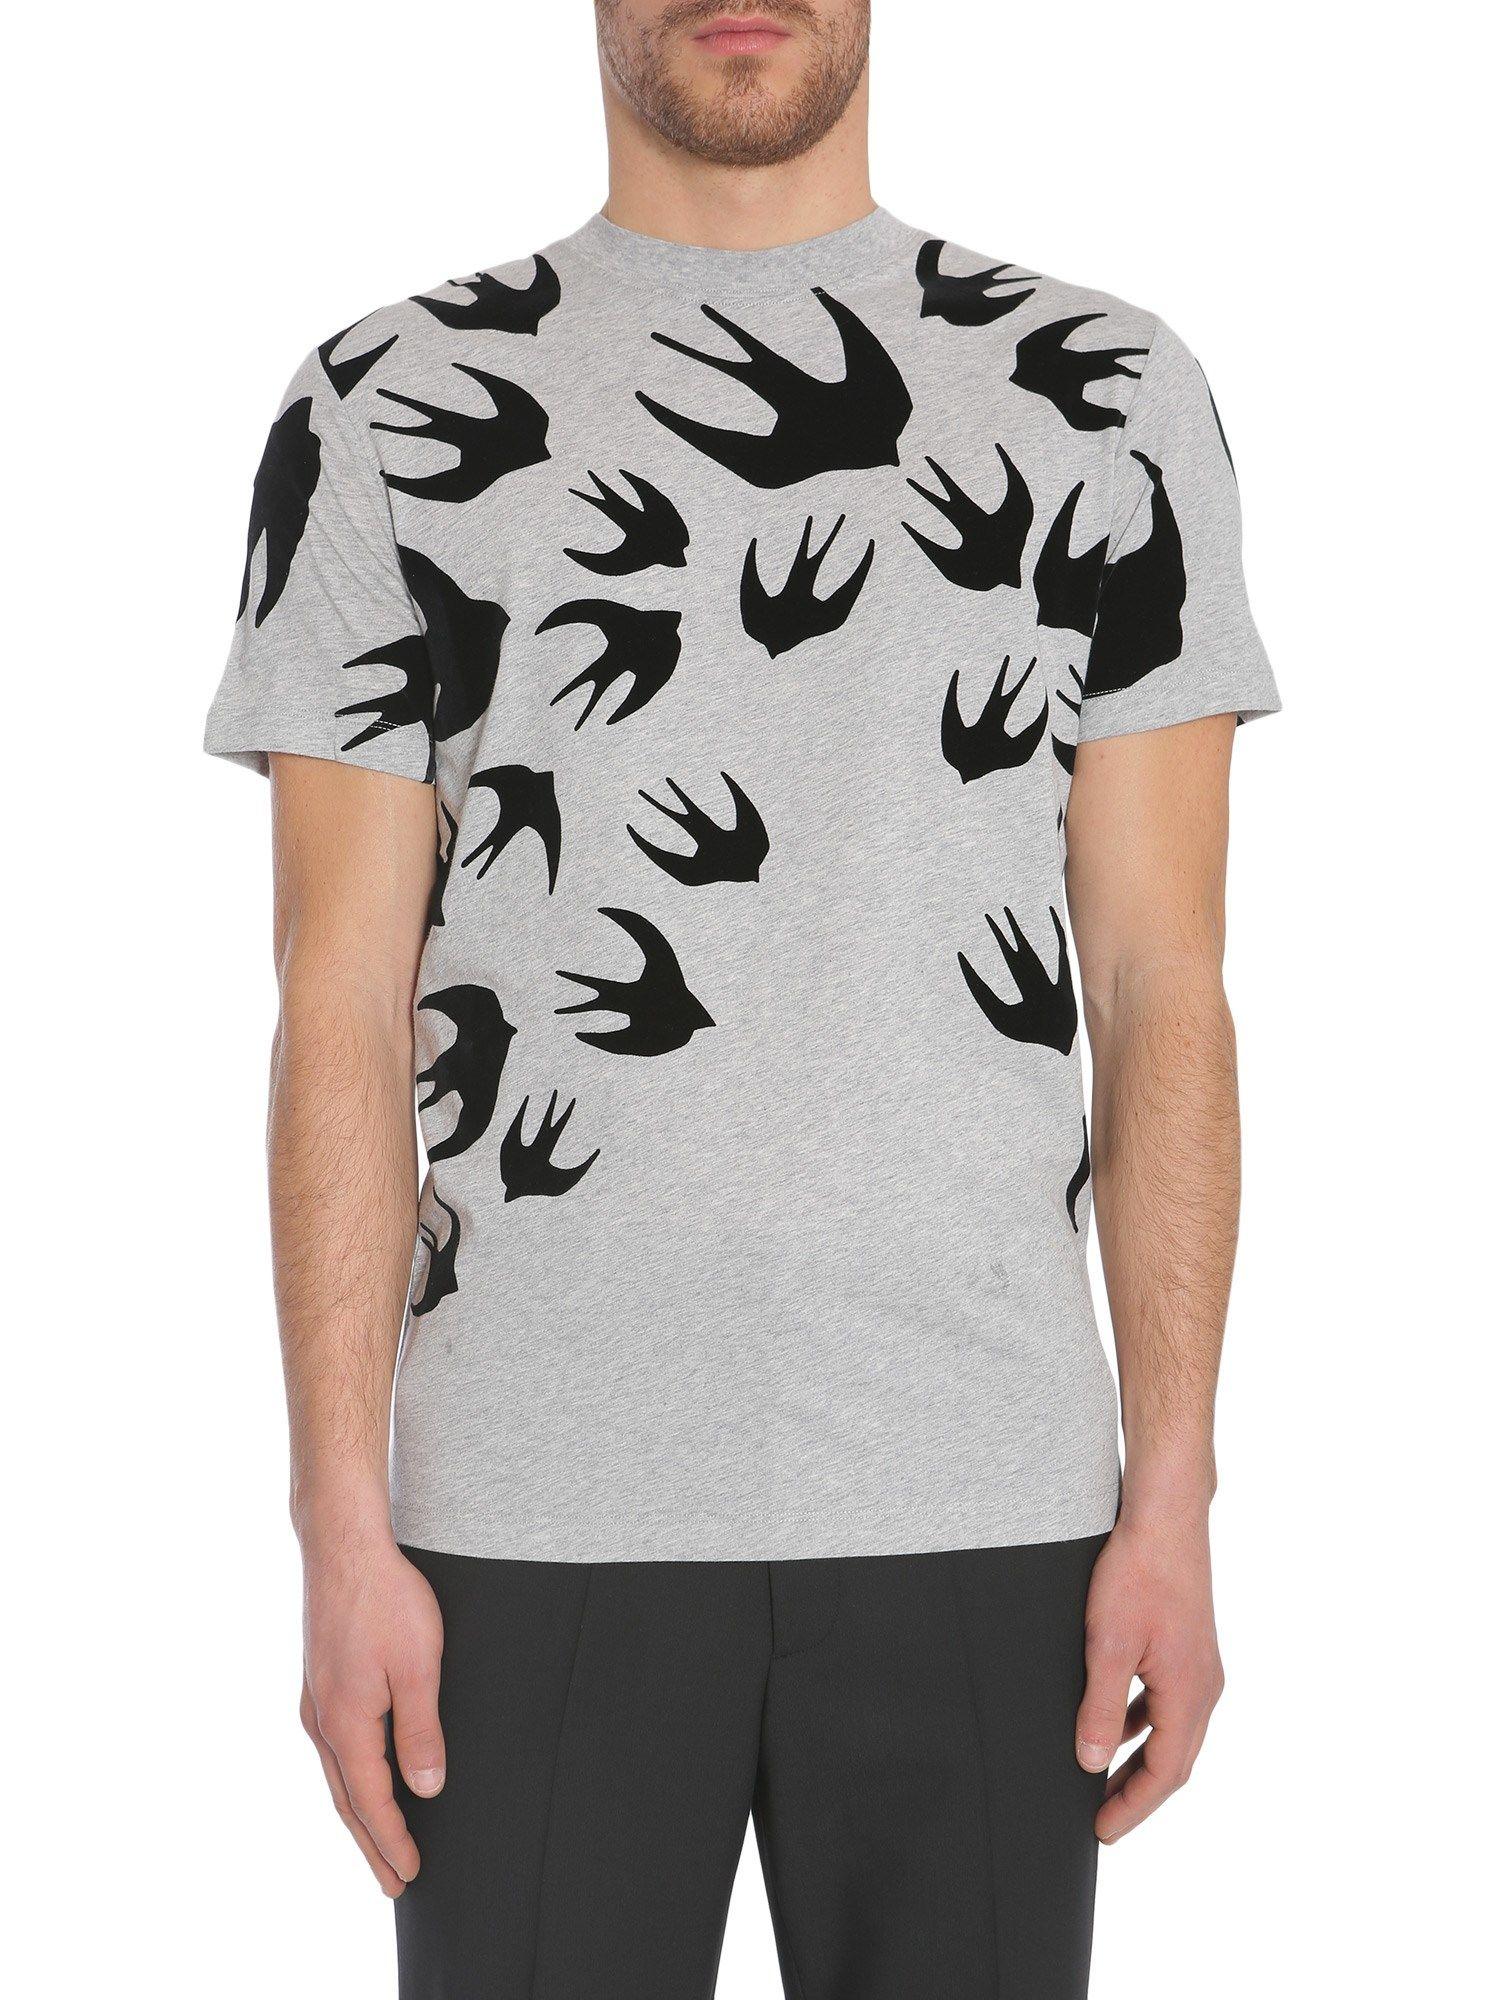 Round Collar T-shirt